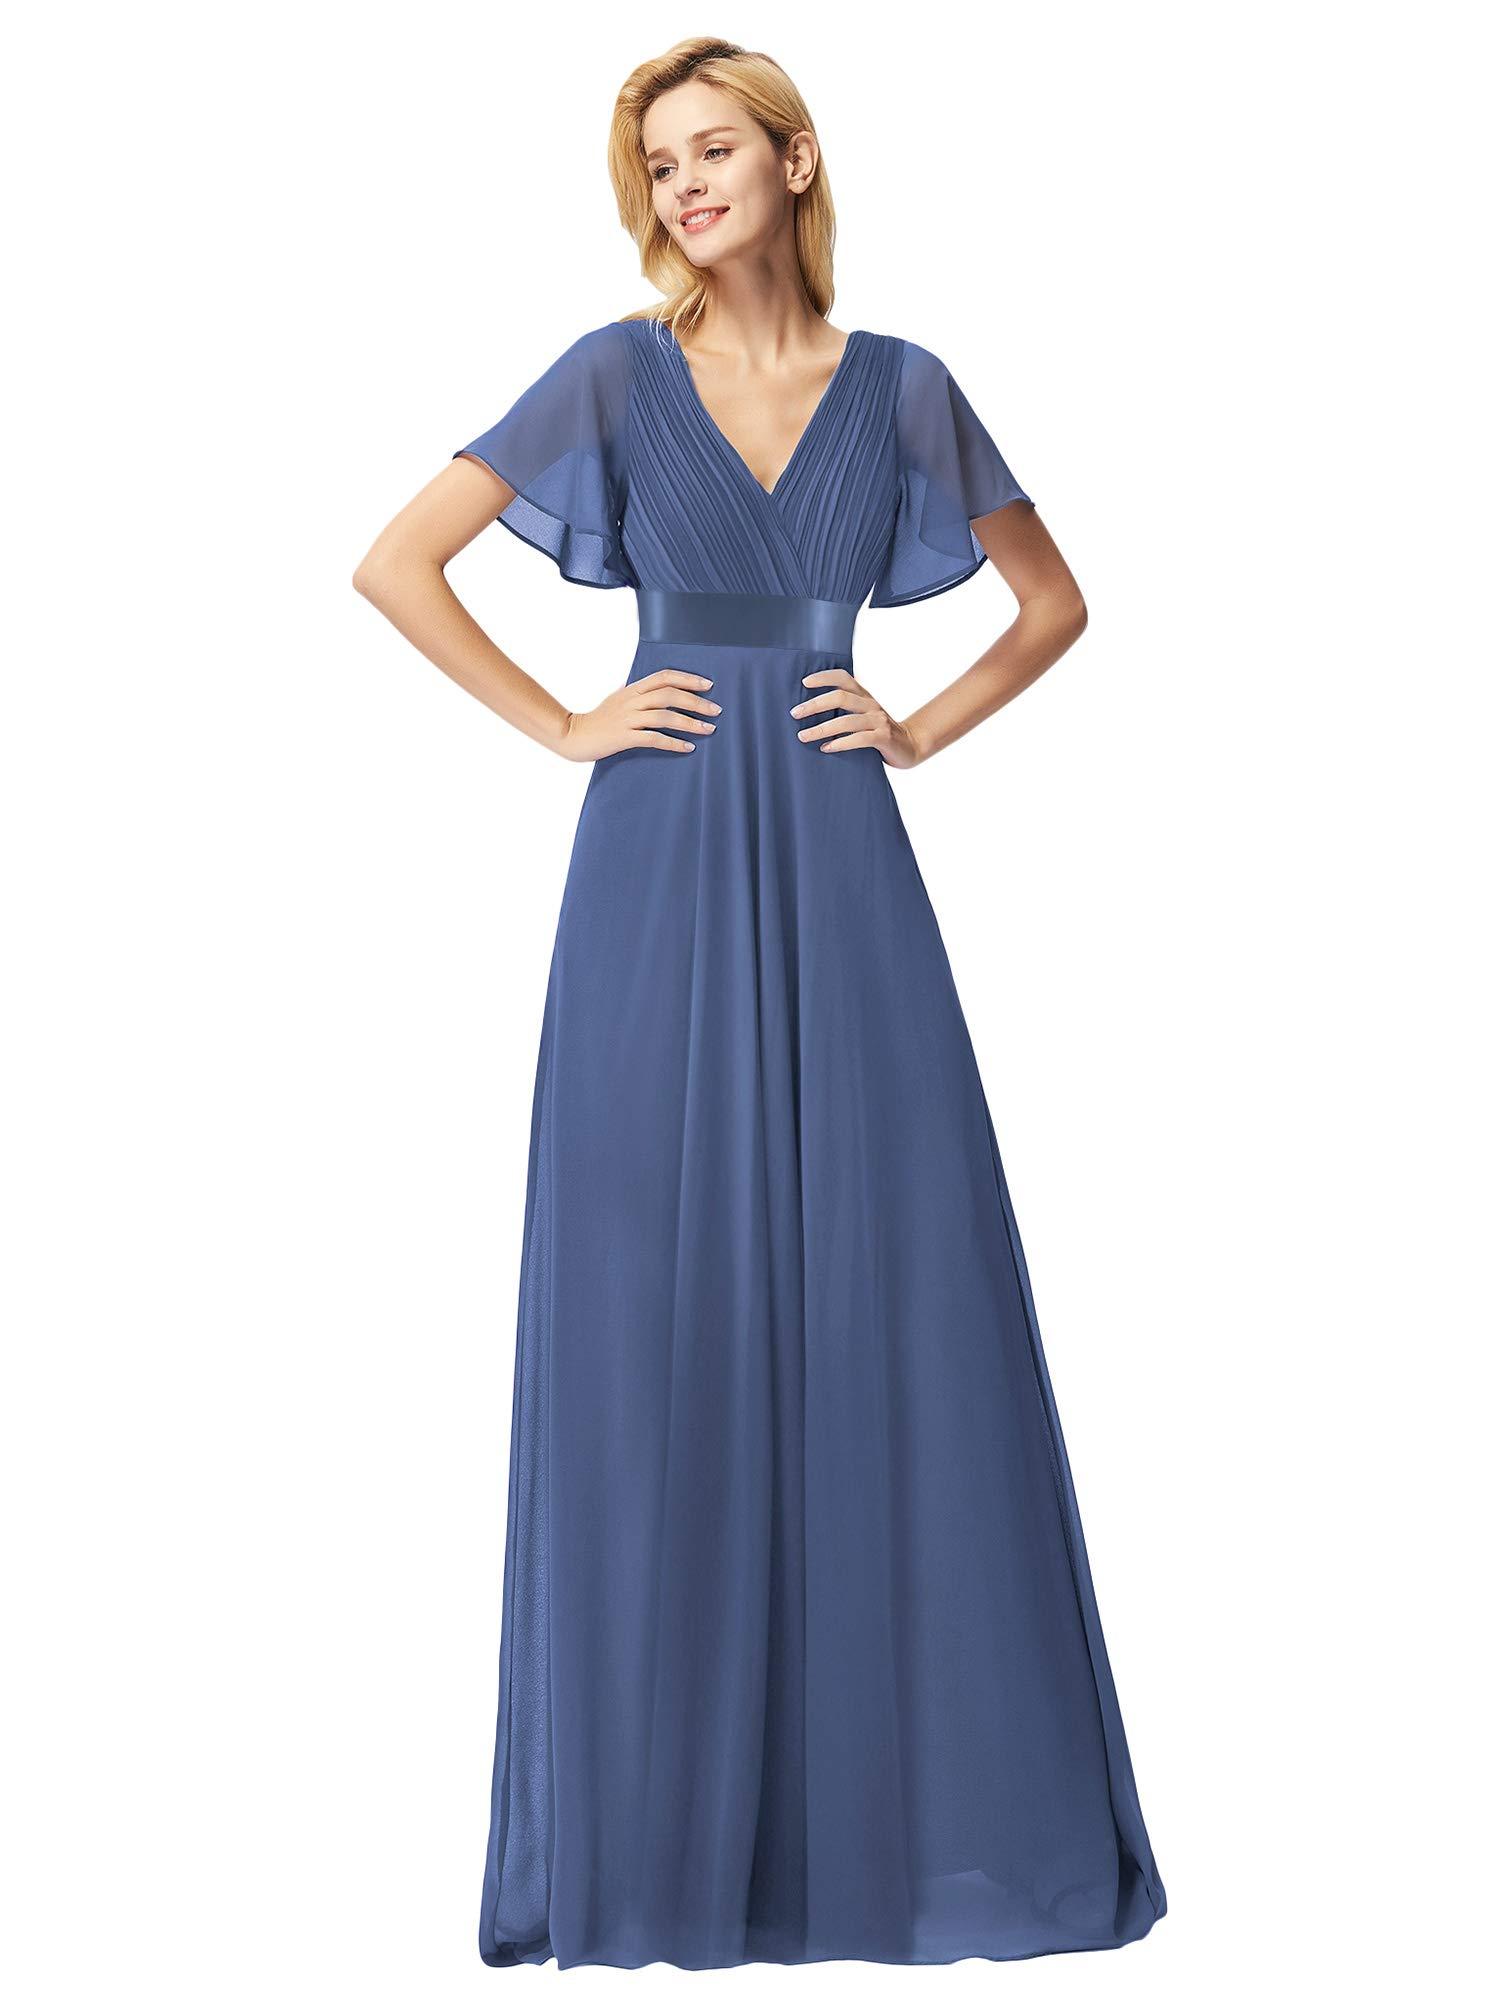 Ever-Pretty Women\'s Plus Size V-Neck Empire Waist Floor Length Bridesmaid  Dress Prom Dresses Blue US20